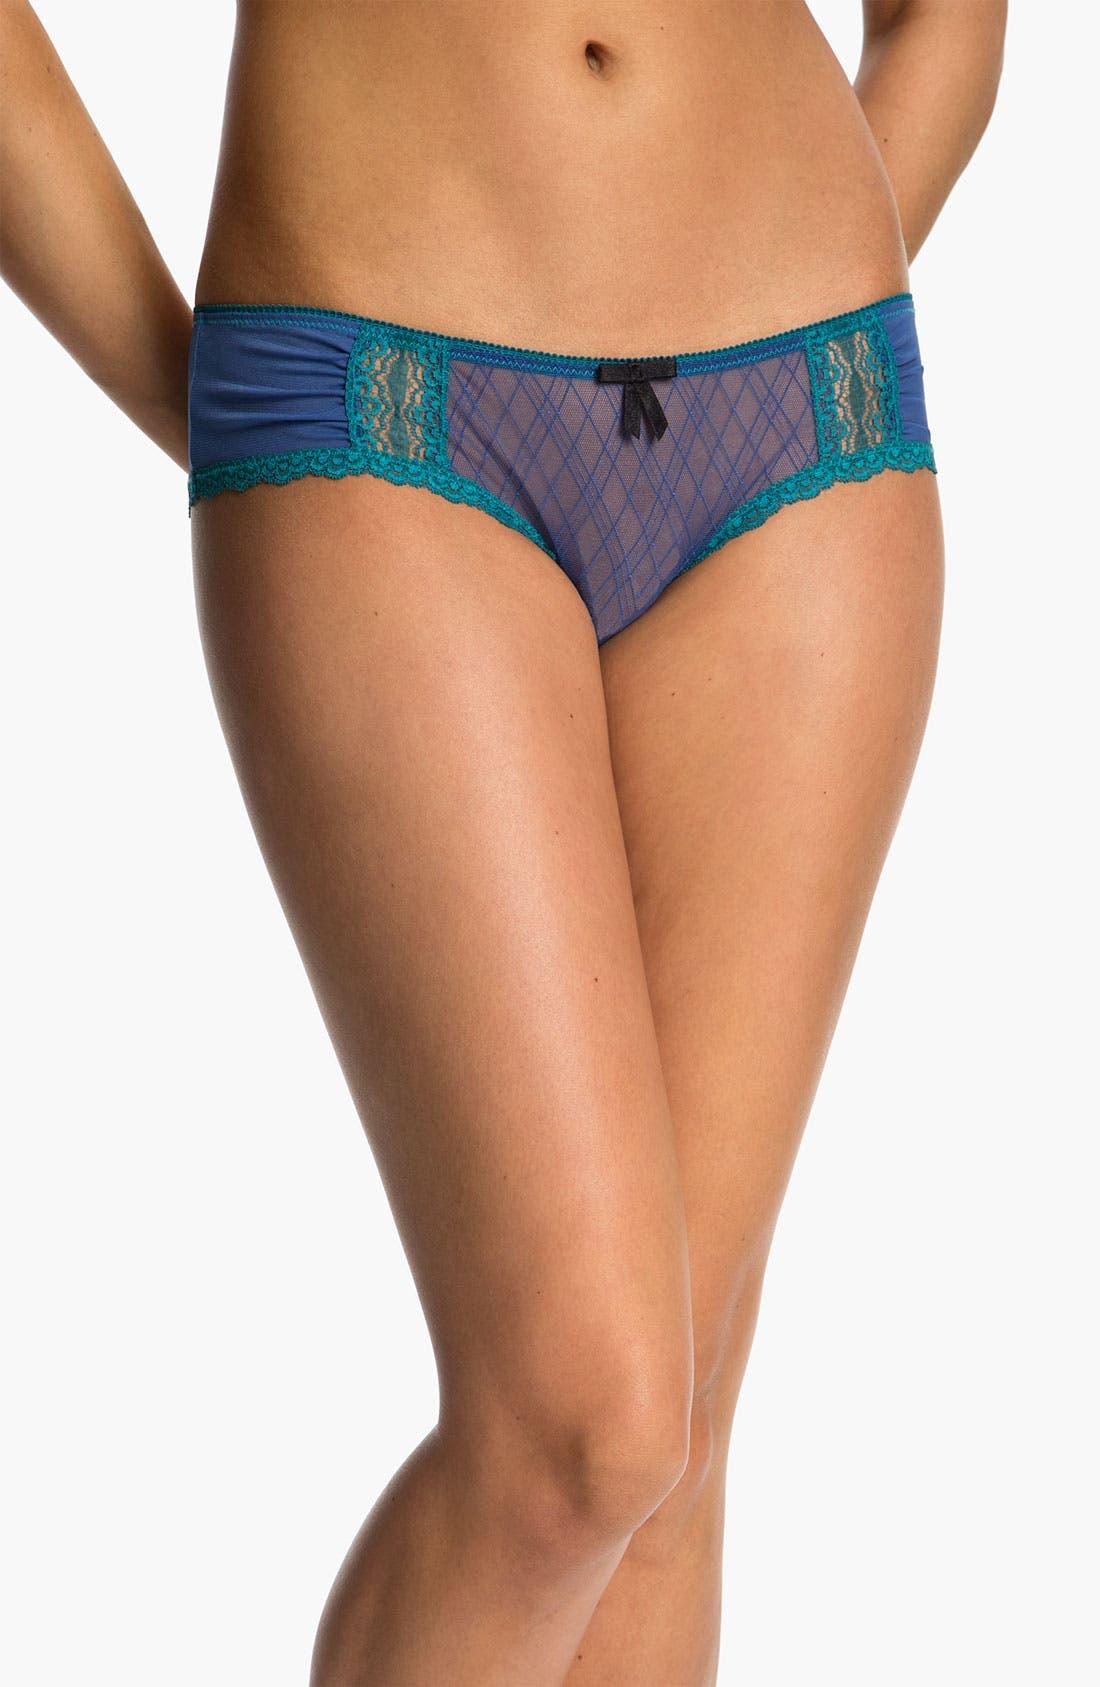 Alternate Image 1 Selected - Honeydew Intimates Mesh & Lace Hipster Panties